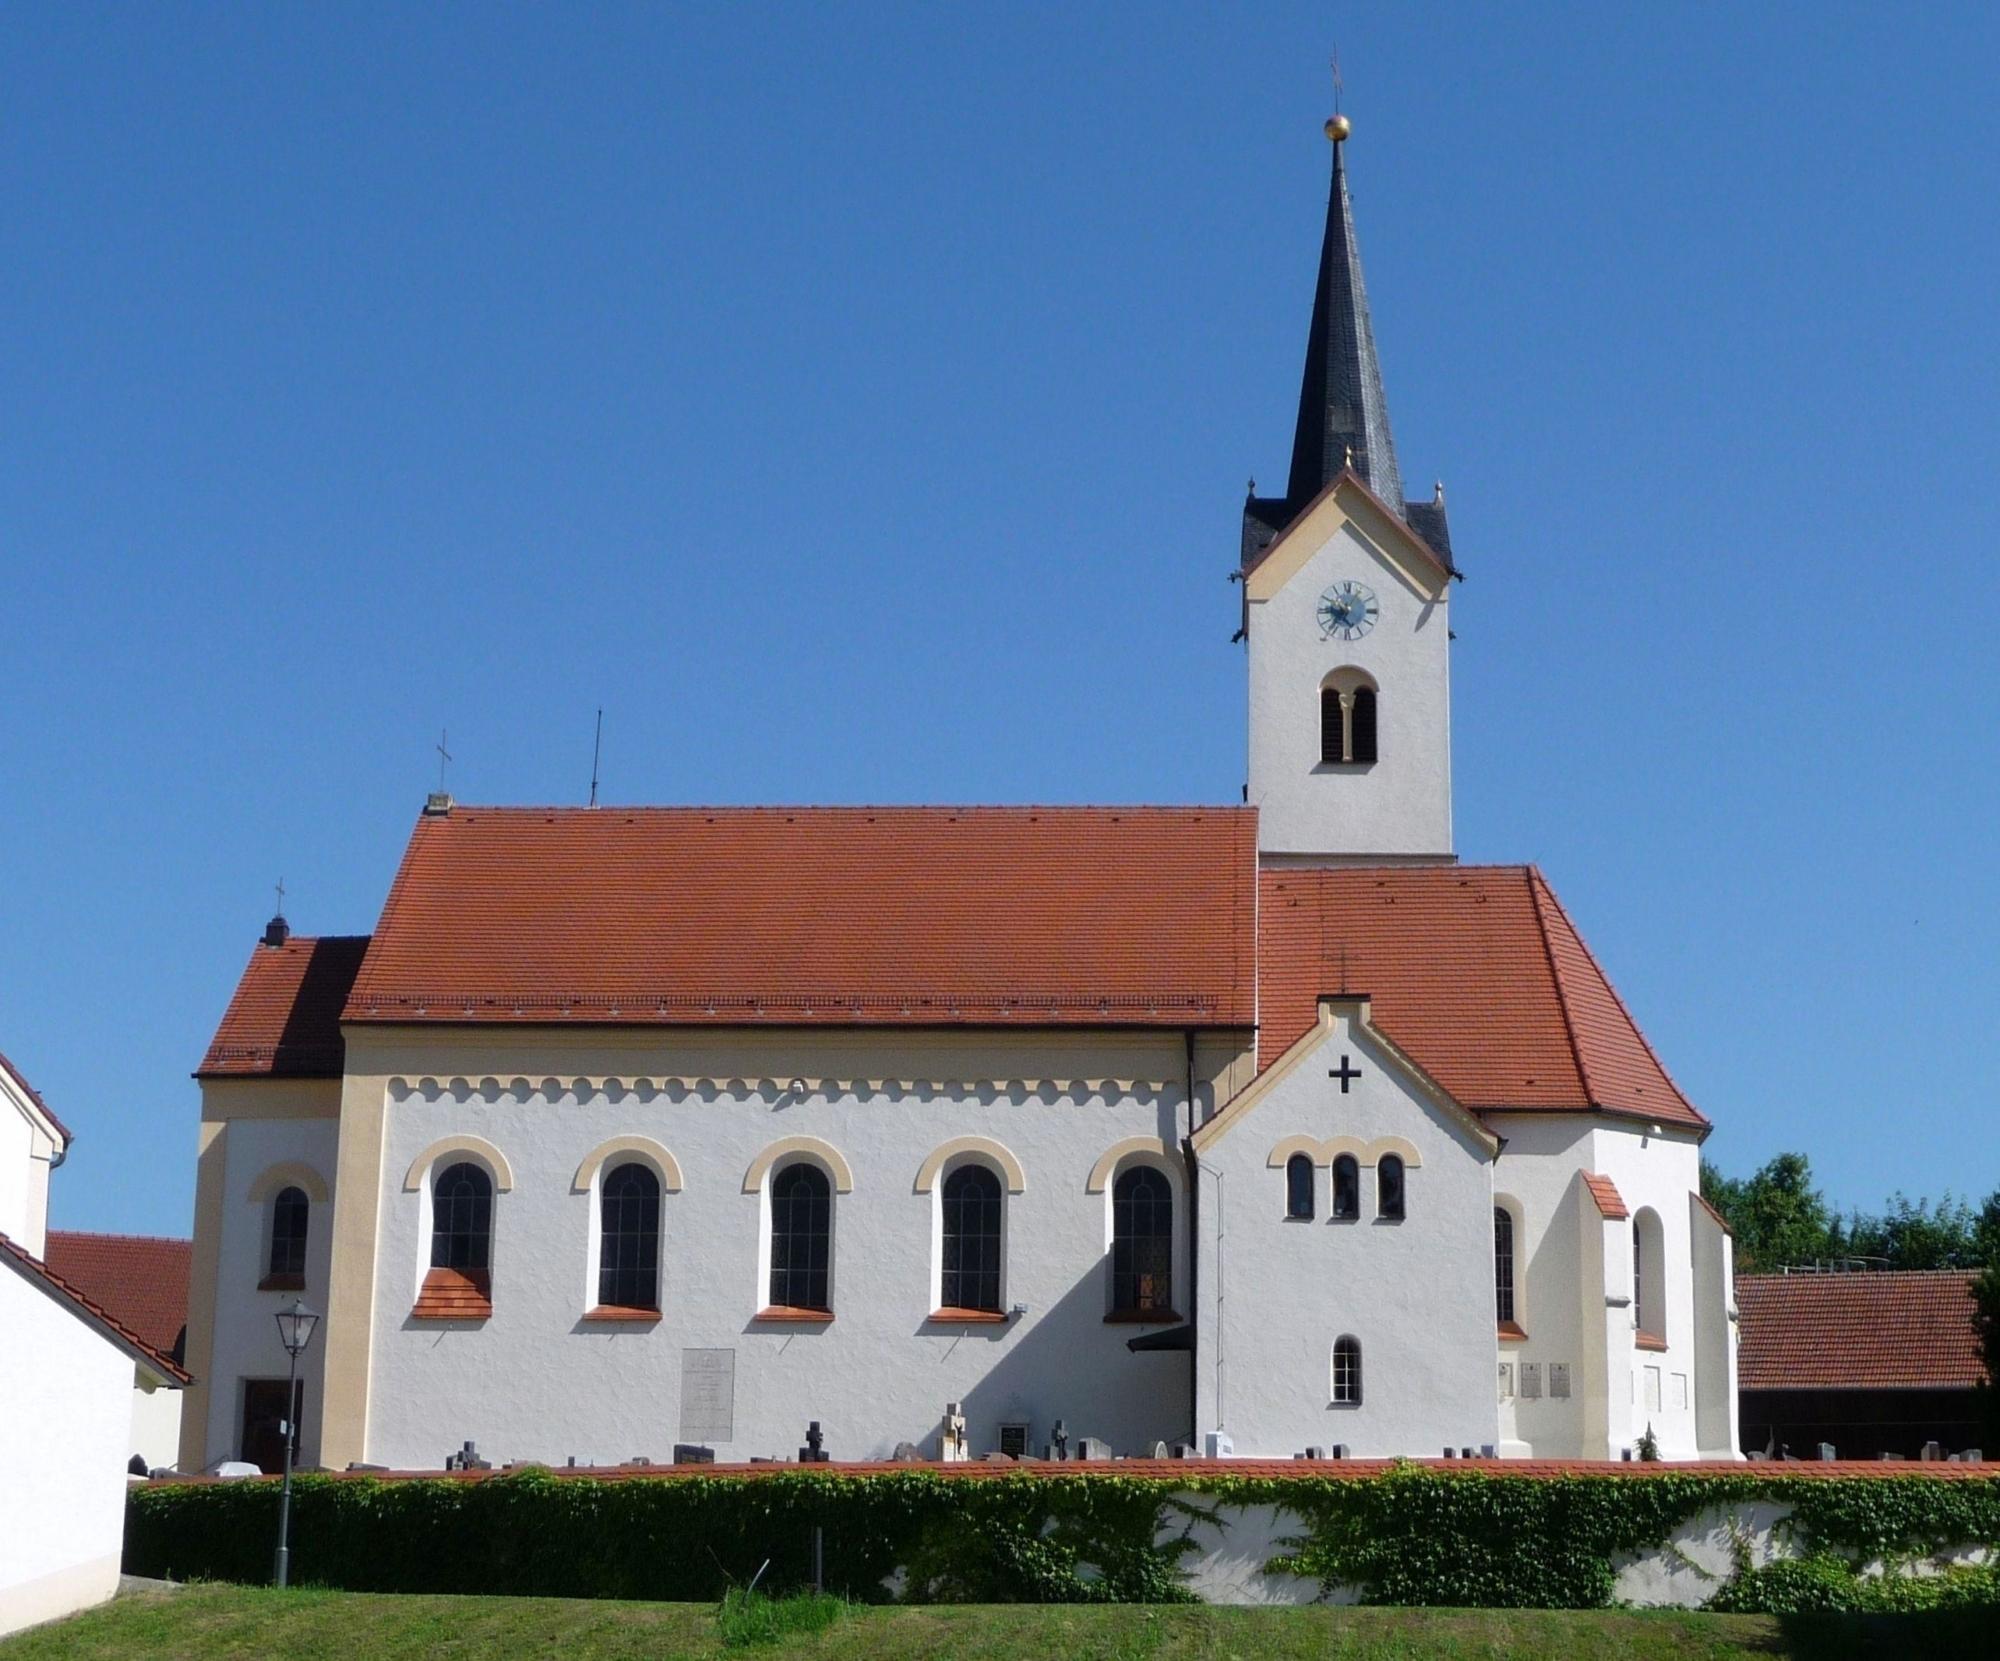 Pfarrkirche Erlbach Oberbayern